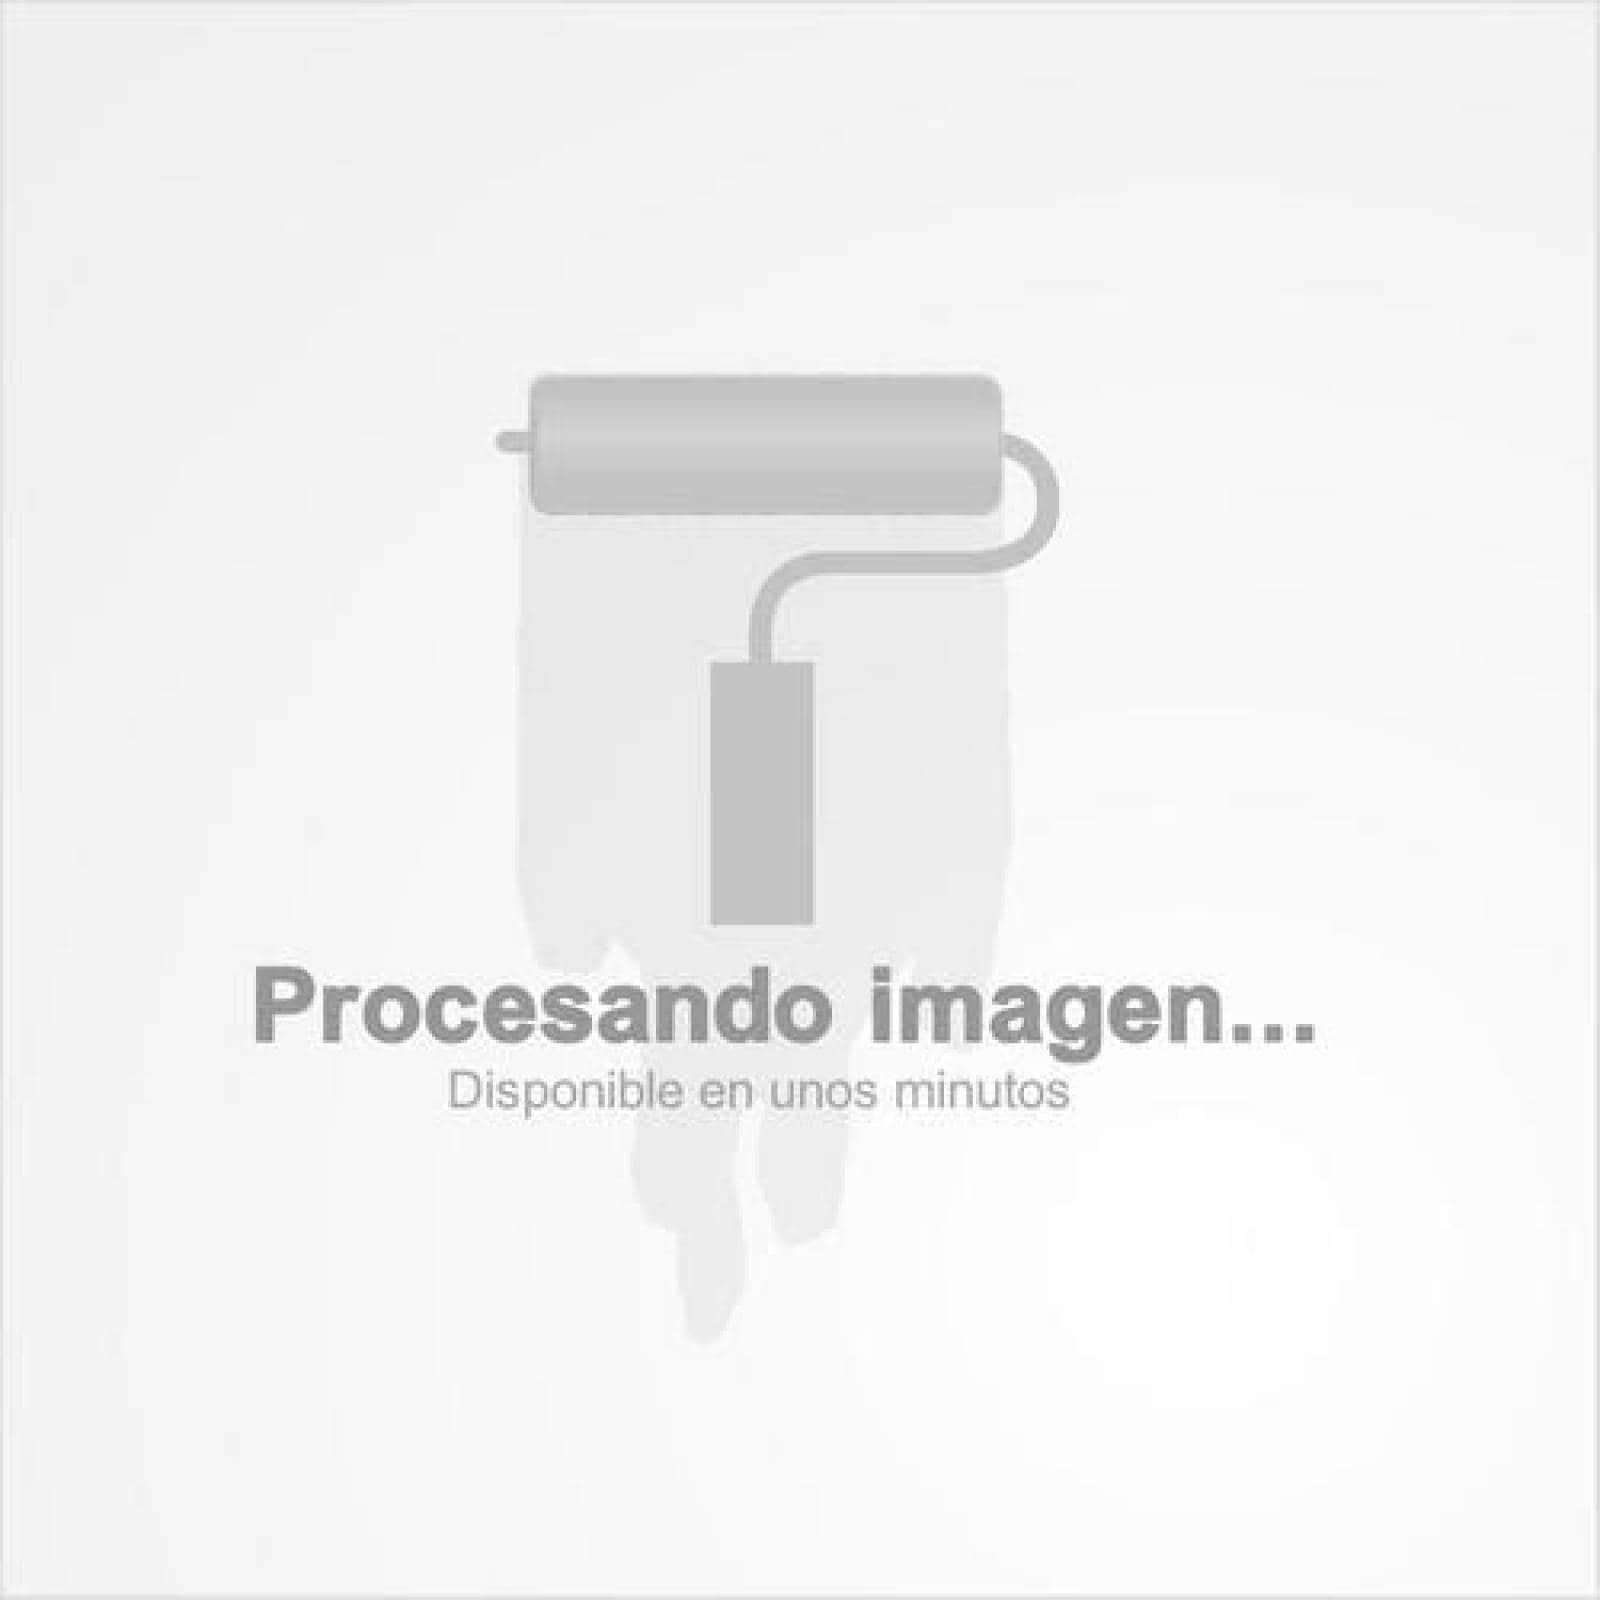 Motobomba 3' De Salida 65 Hp Truper 17117